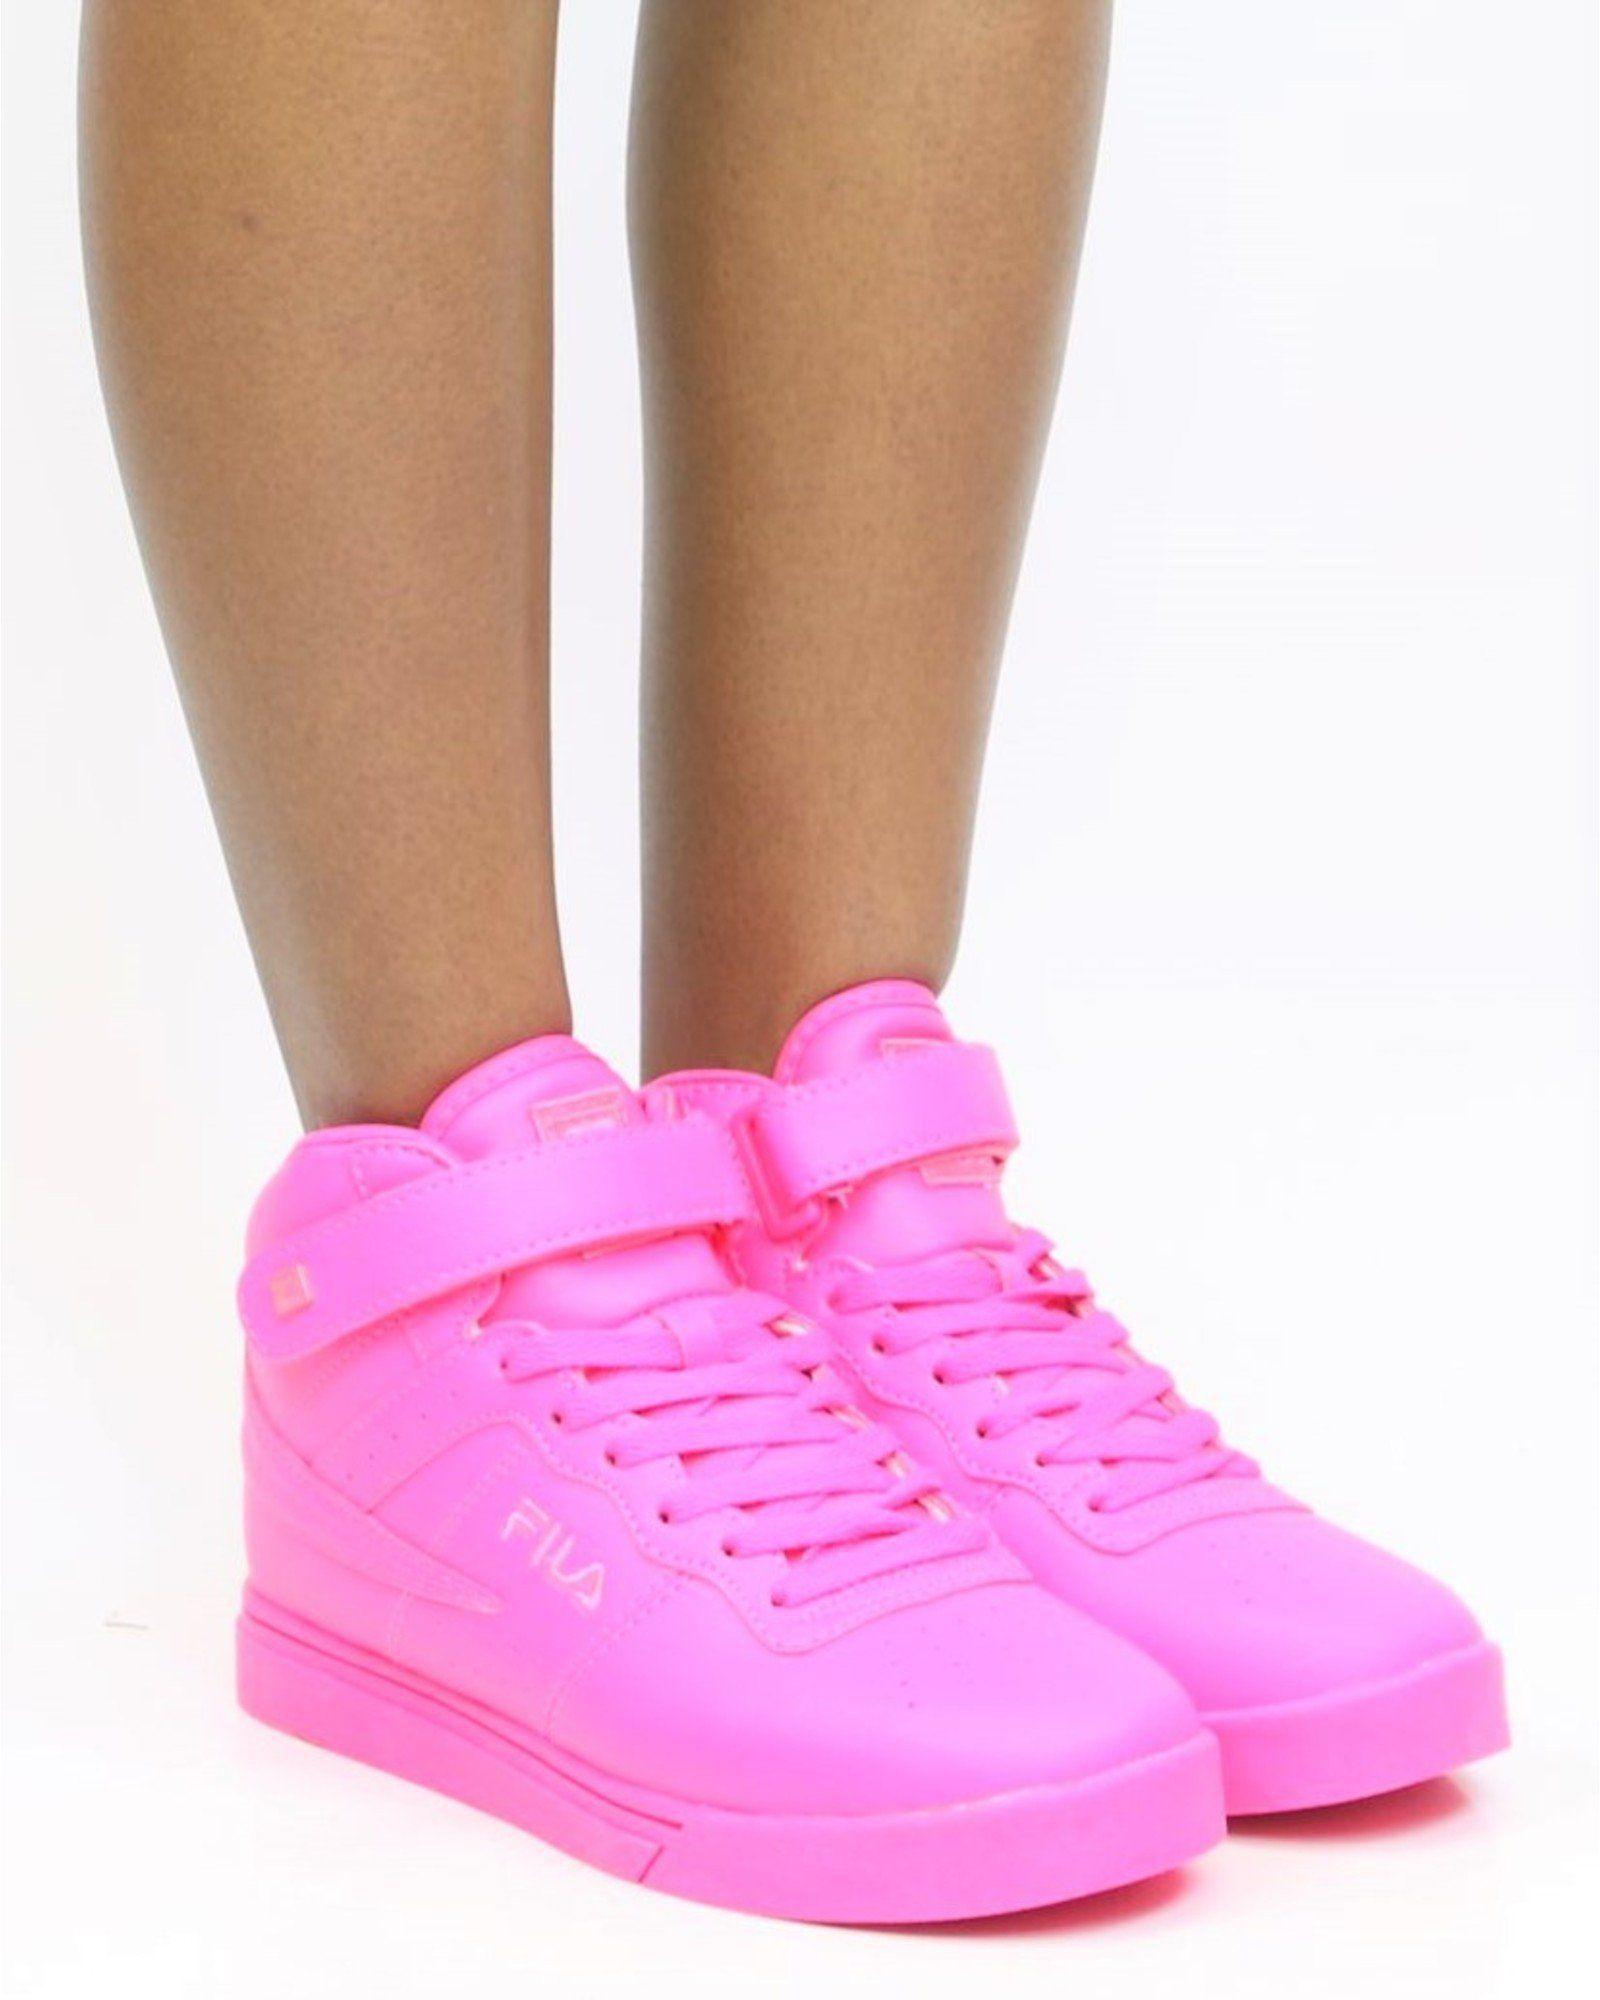 8119728e86c9b Vulc 13 Mp Tonal | Products | Sneakers, Soft fabrics, Casual